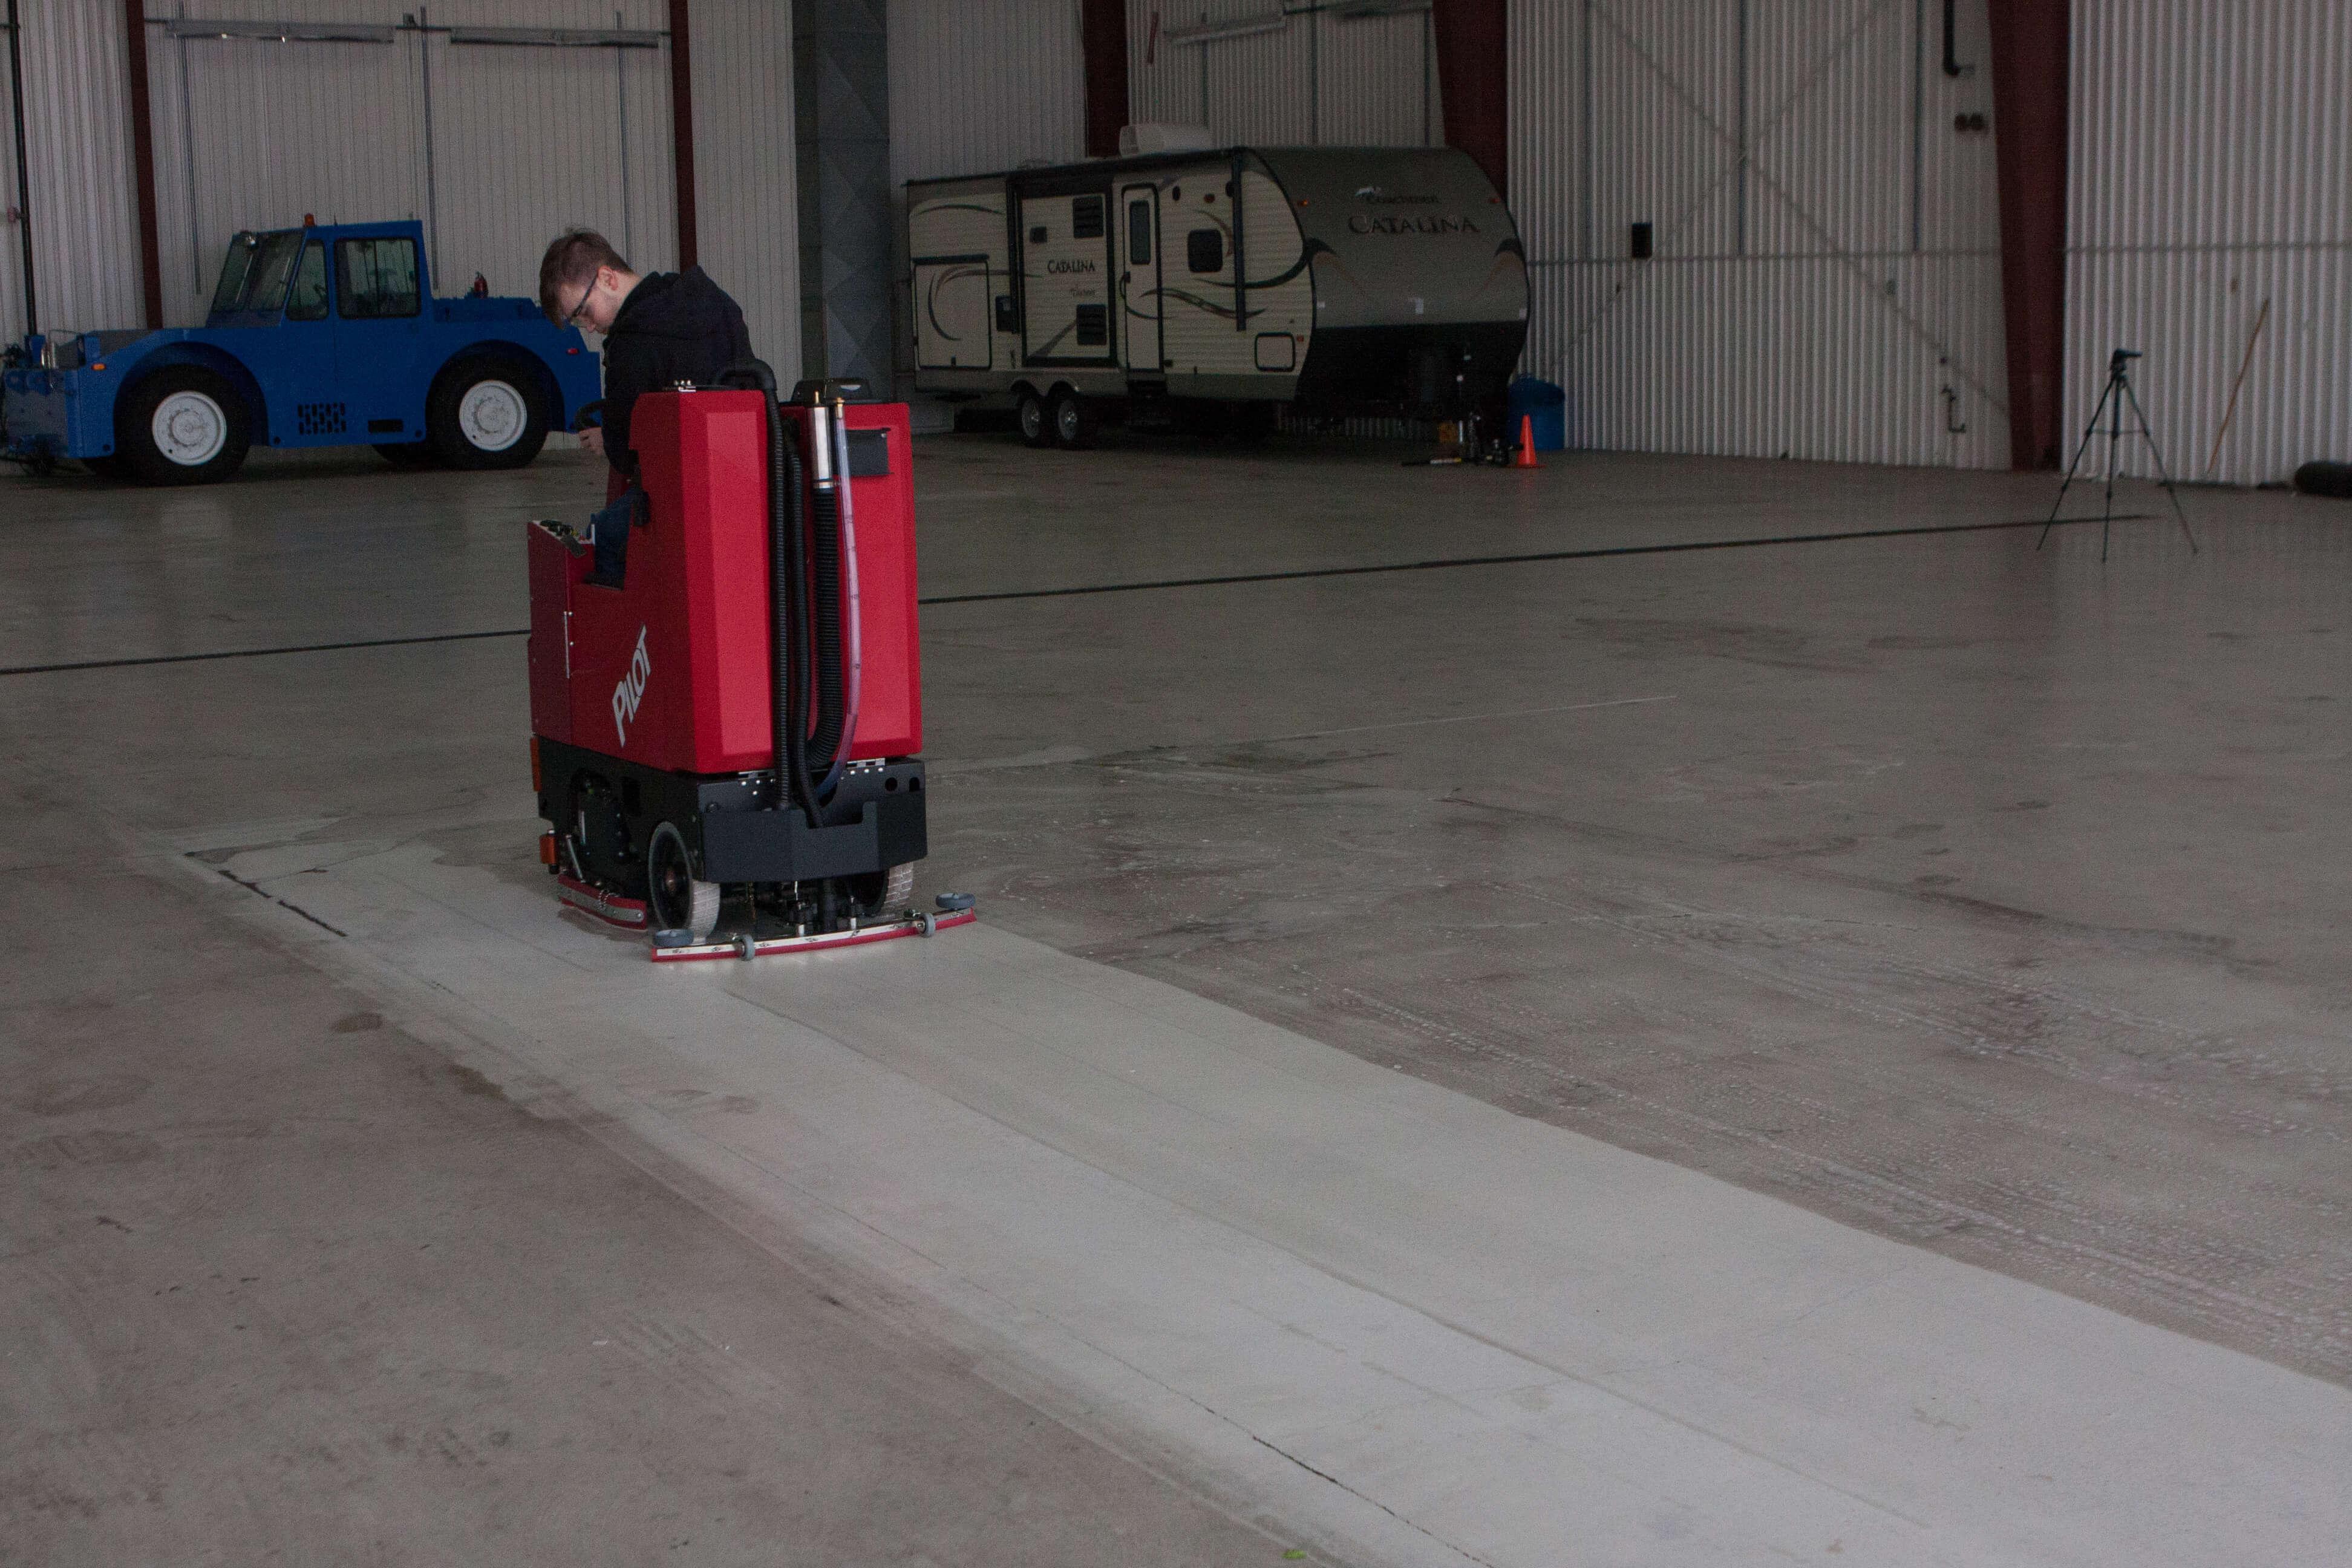 disk garage factory scrubbers industrial mach service type grabfile floor floors cat in cleaning tomcat gtx gallery scrubber deck photogallery fn